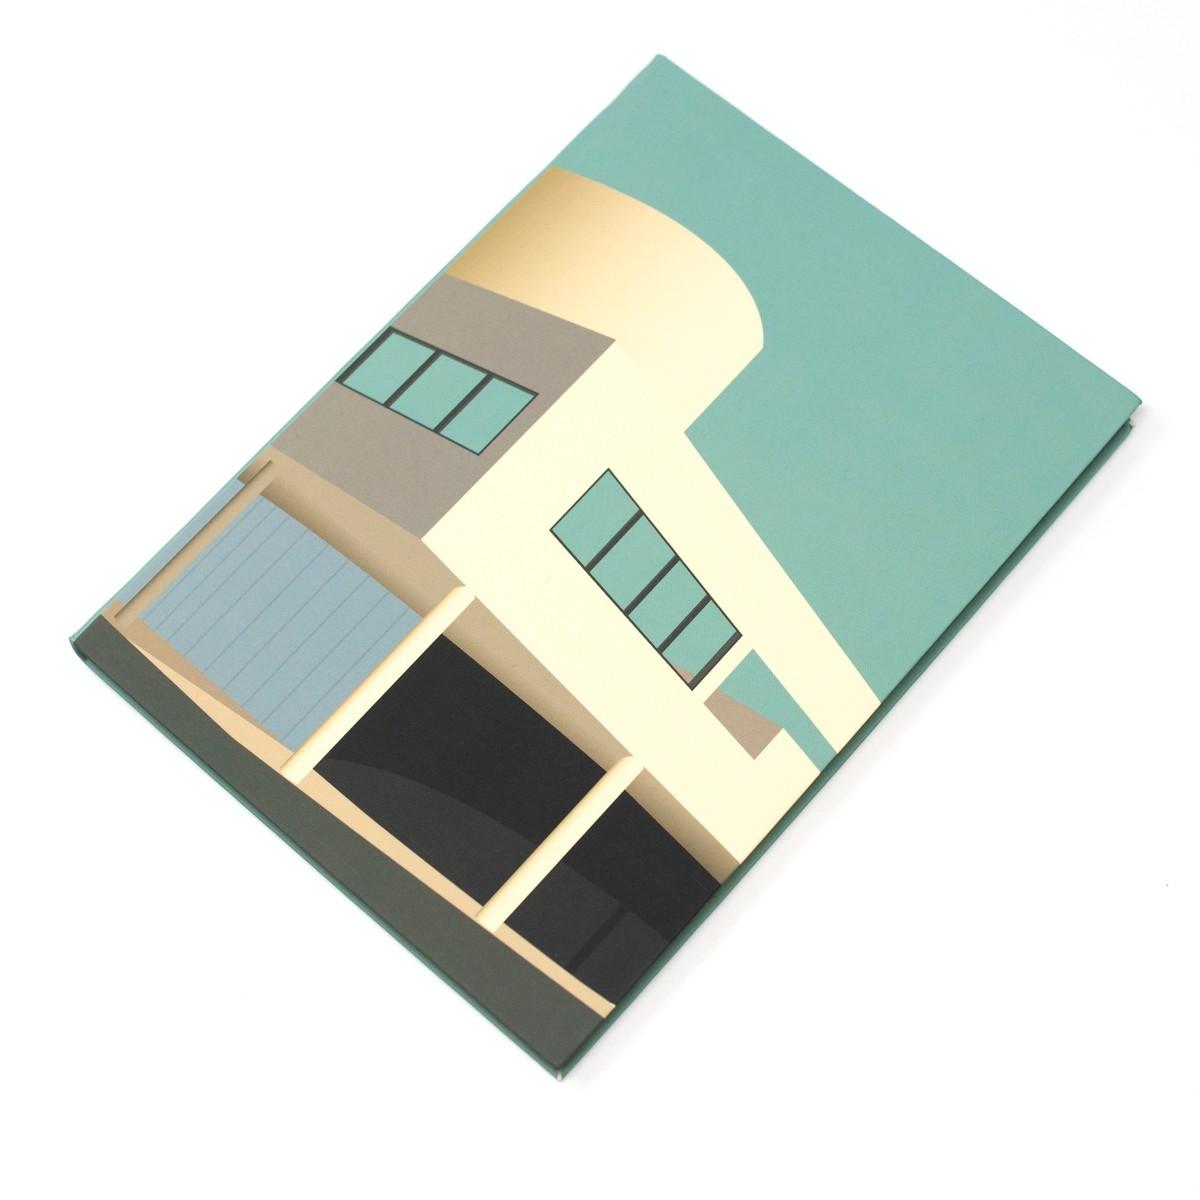 Photo of Villa Savoye Architecture Notebook